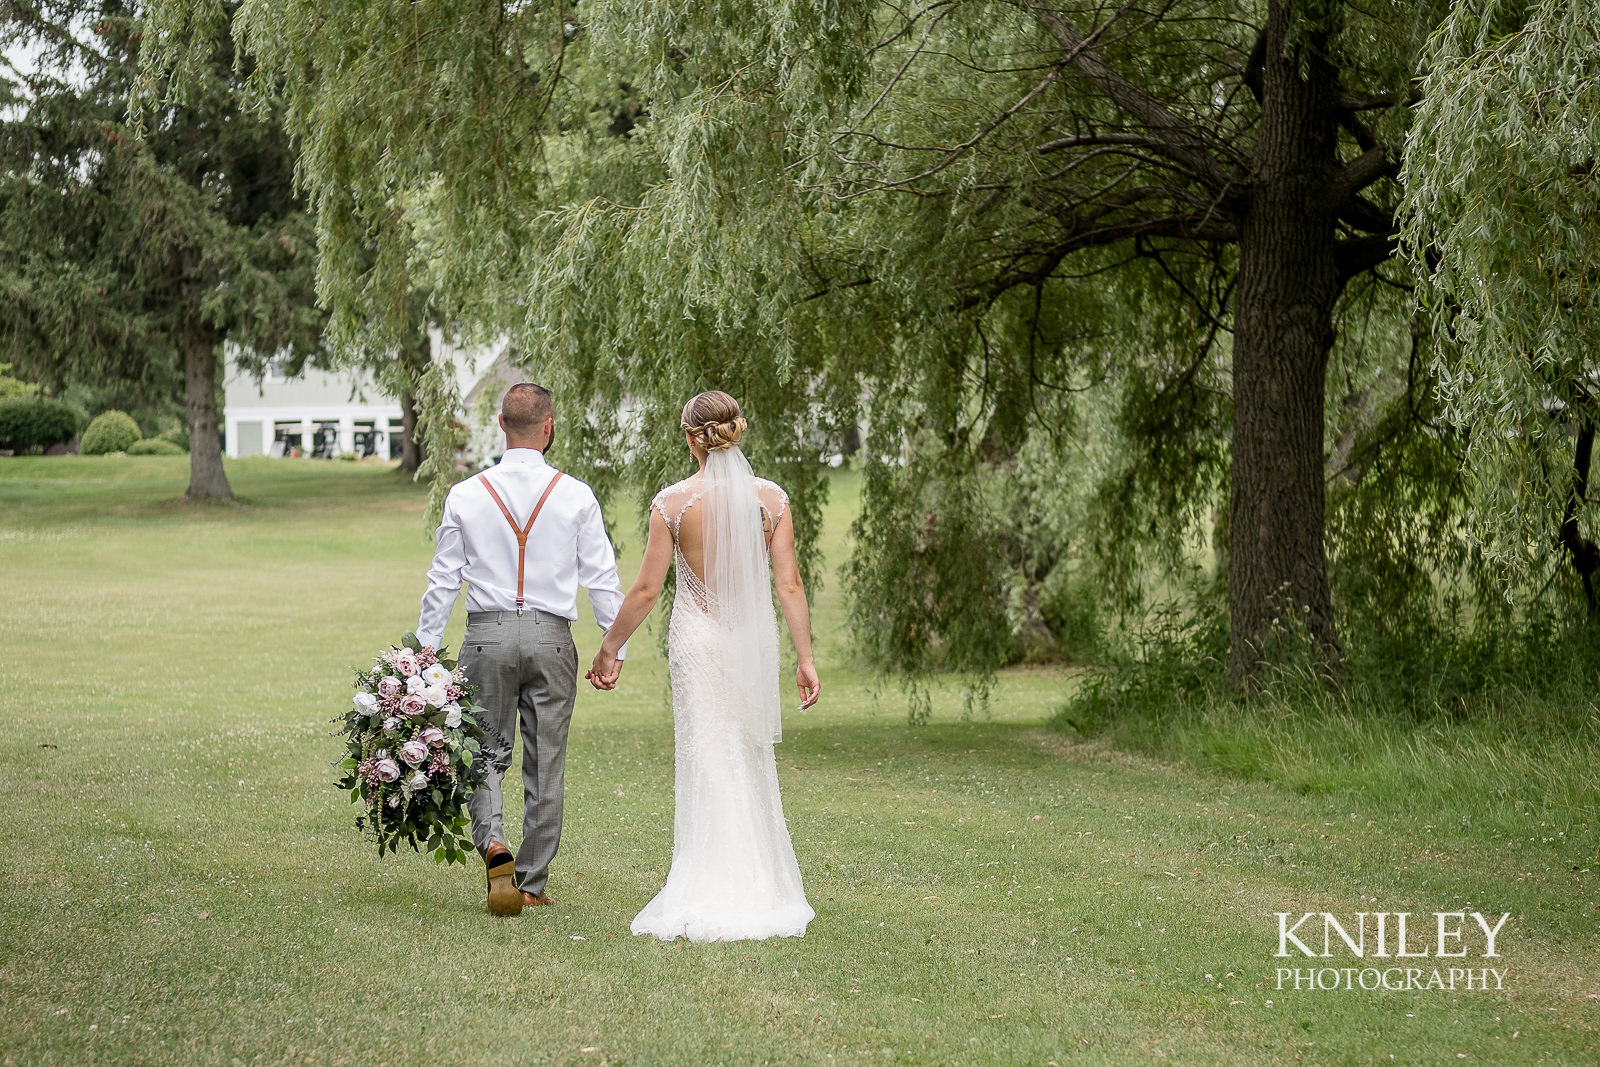 074 - Ontario Golf Club Wedding Pictures - XT2A6971.jpg